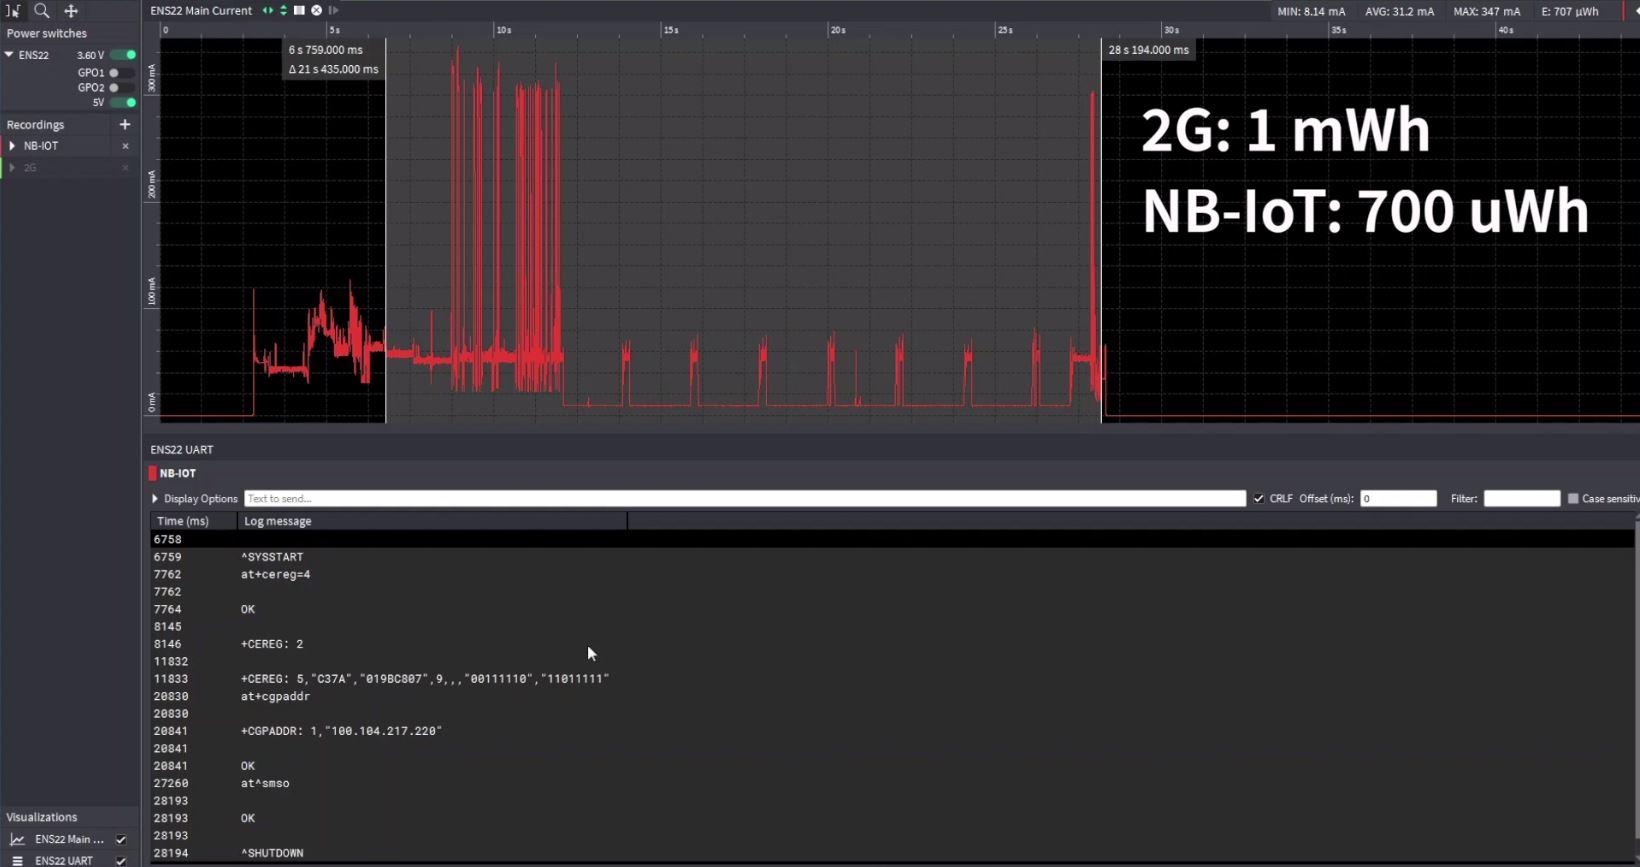 Otii recording of NB-IoT startup